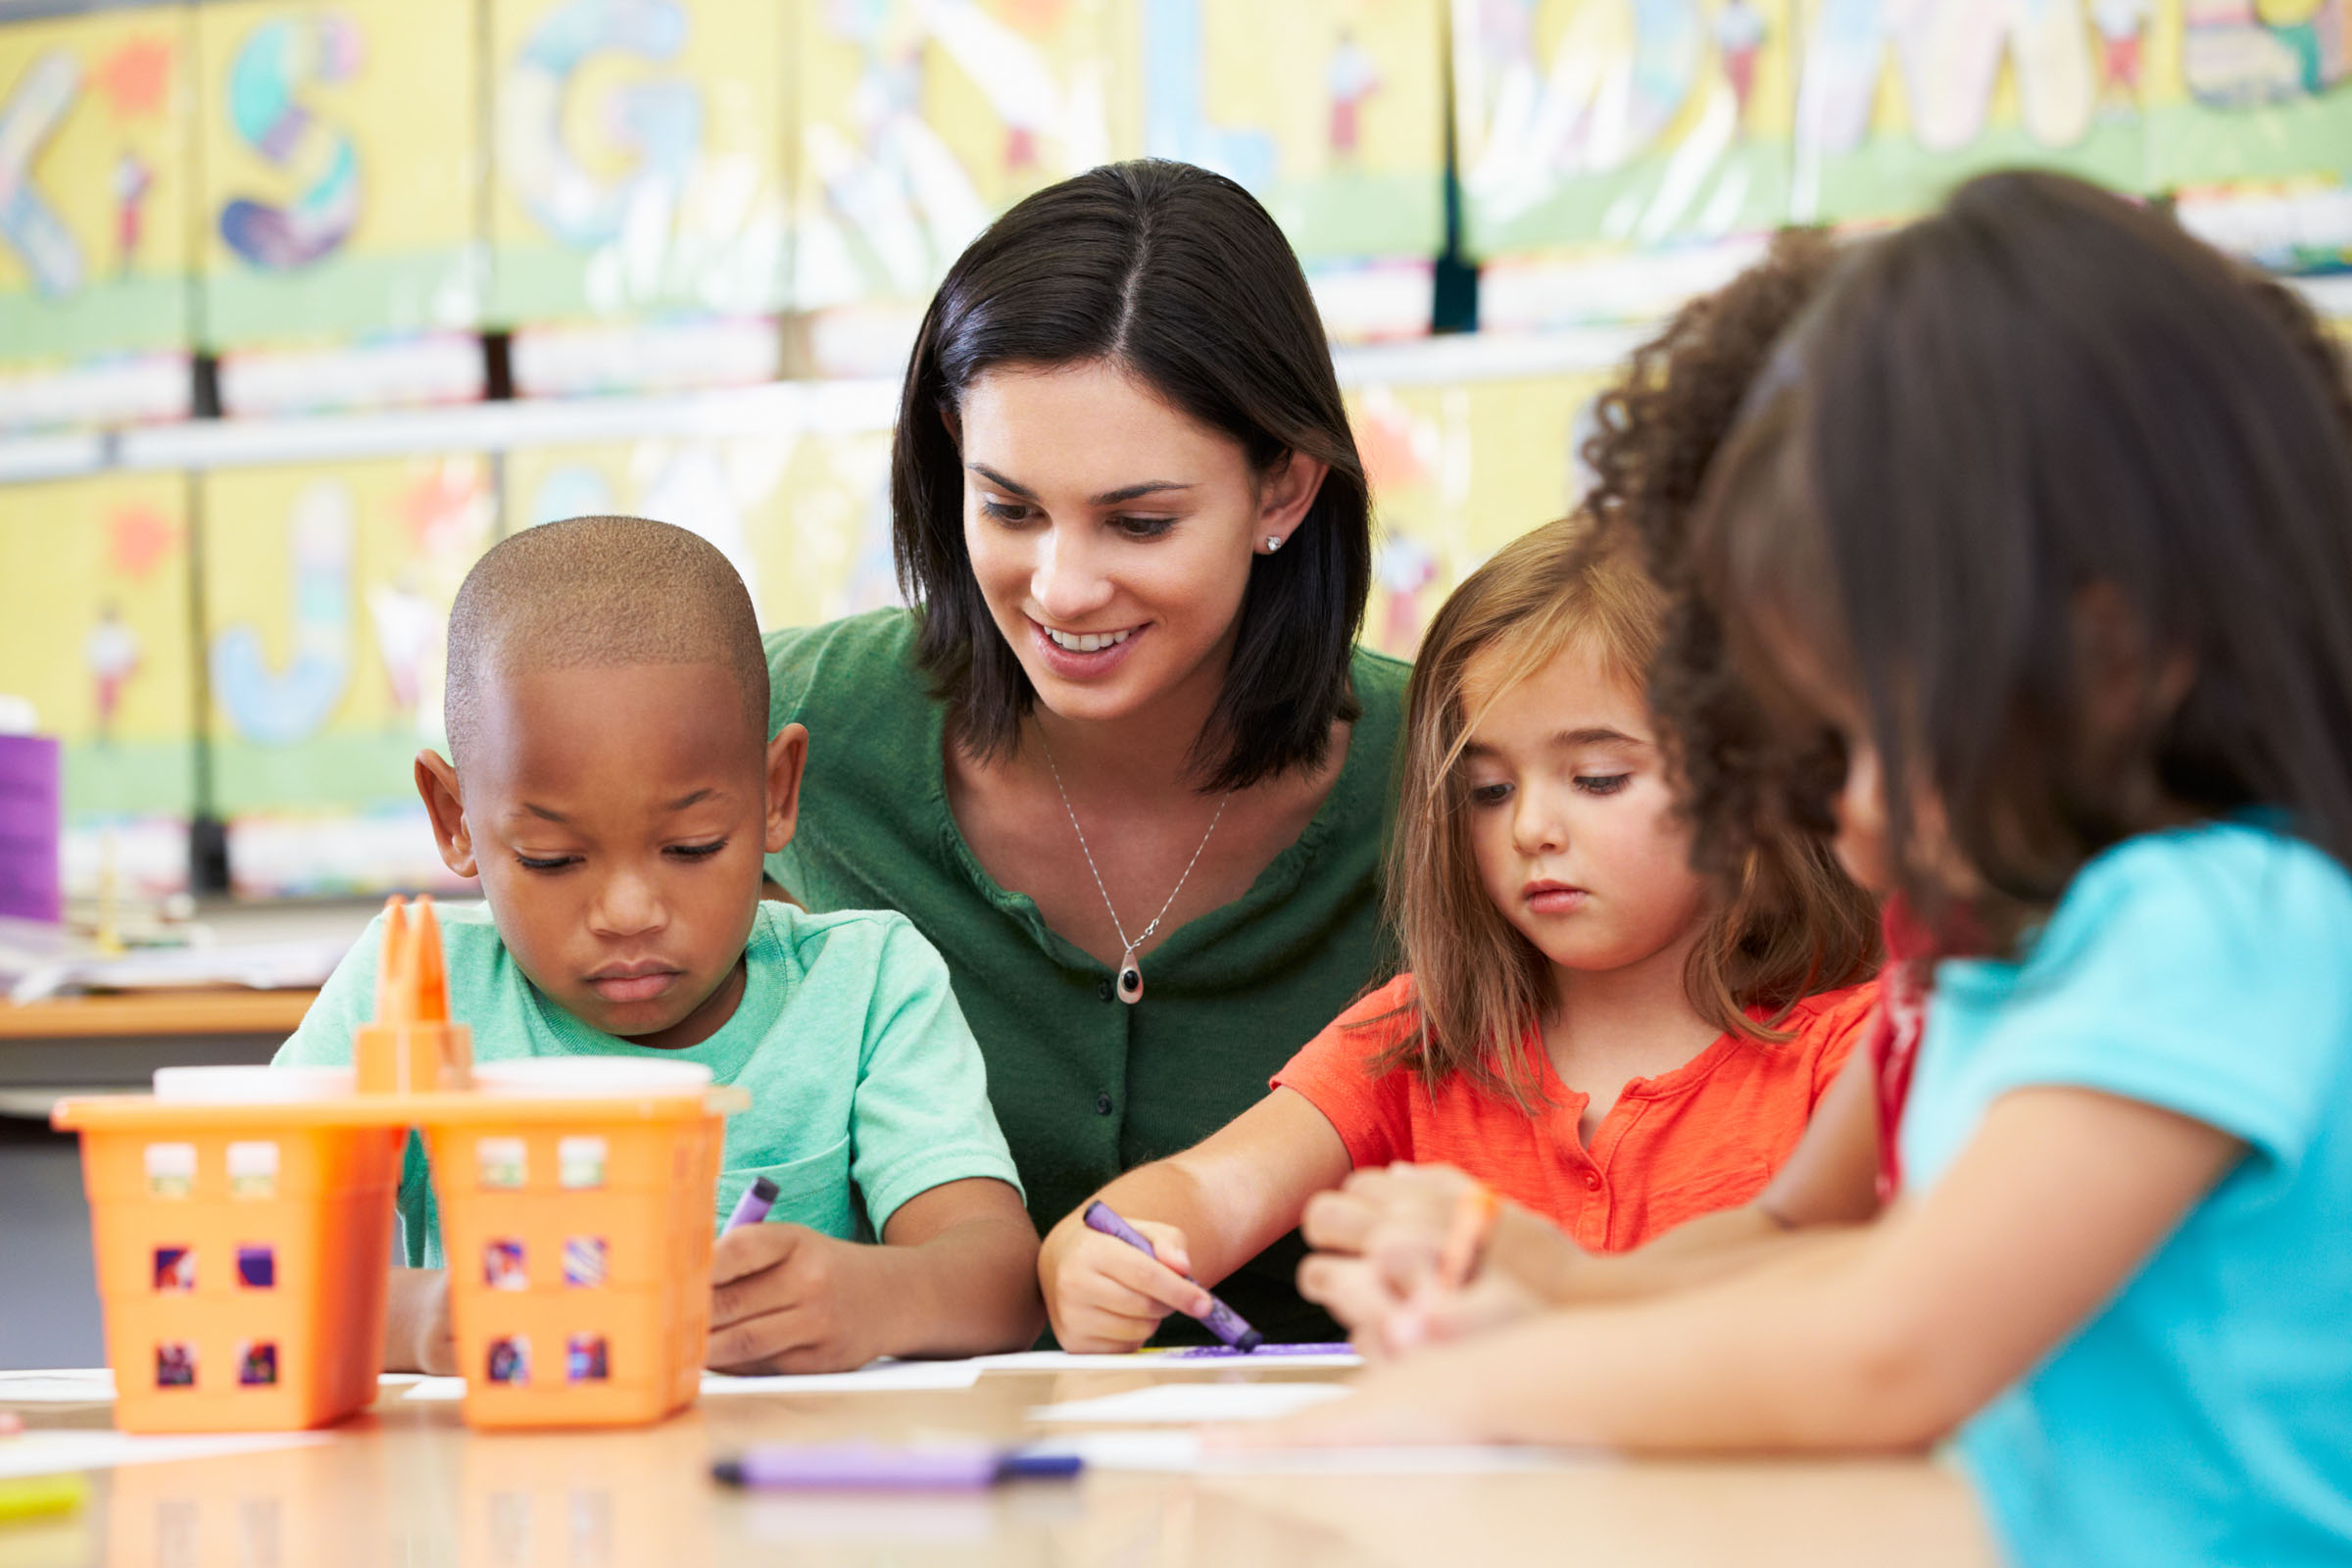 Preschool Pals group coloring